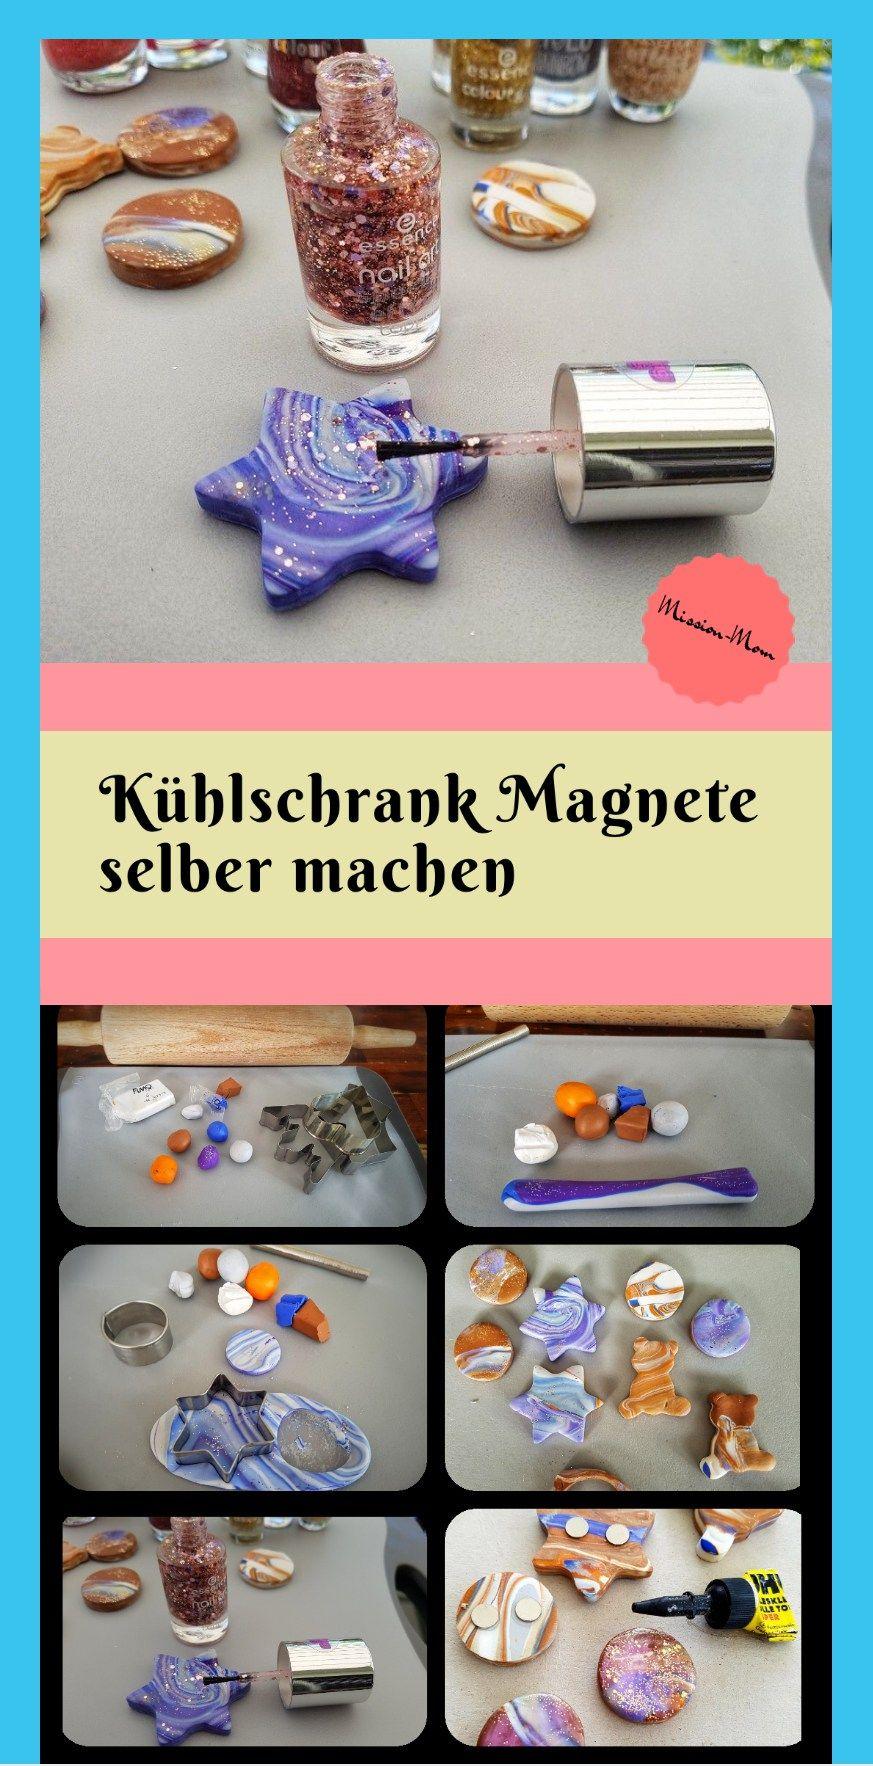 diy magnete aus fimo ein tolles geschenk mit kindern basteln mission mom. Black Bedroom Furniture Sets. Home Design Ideas